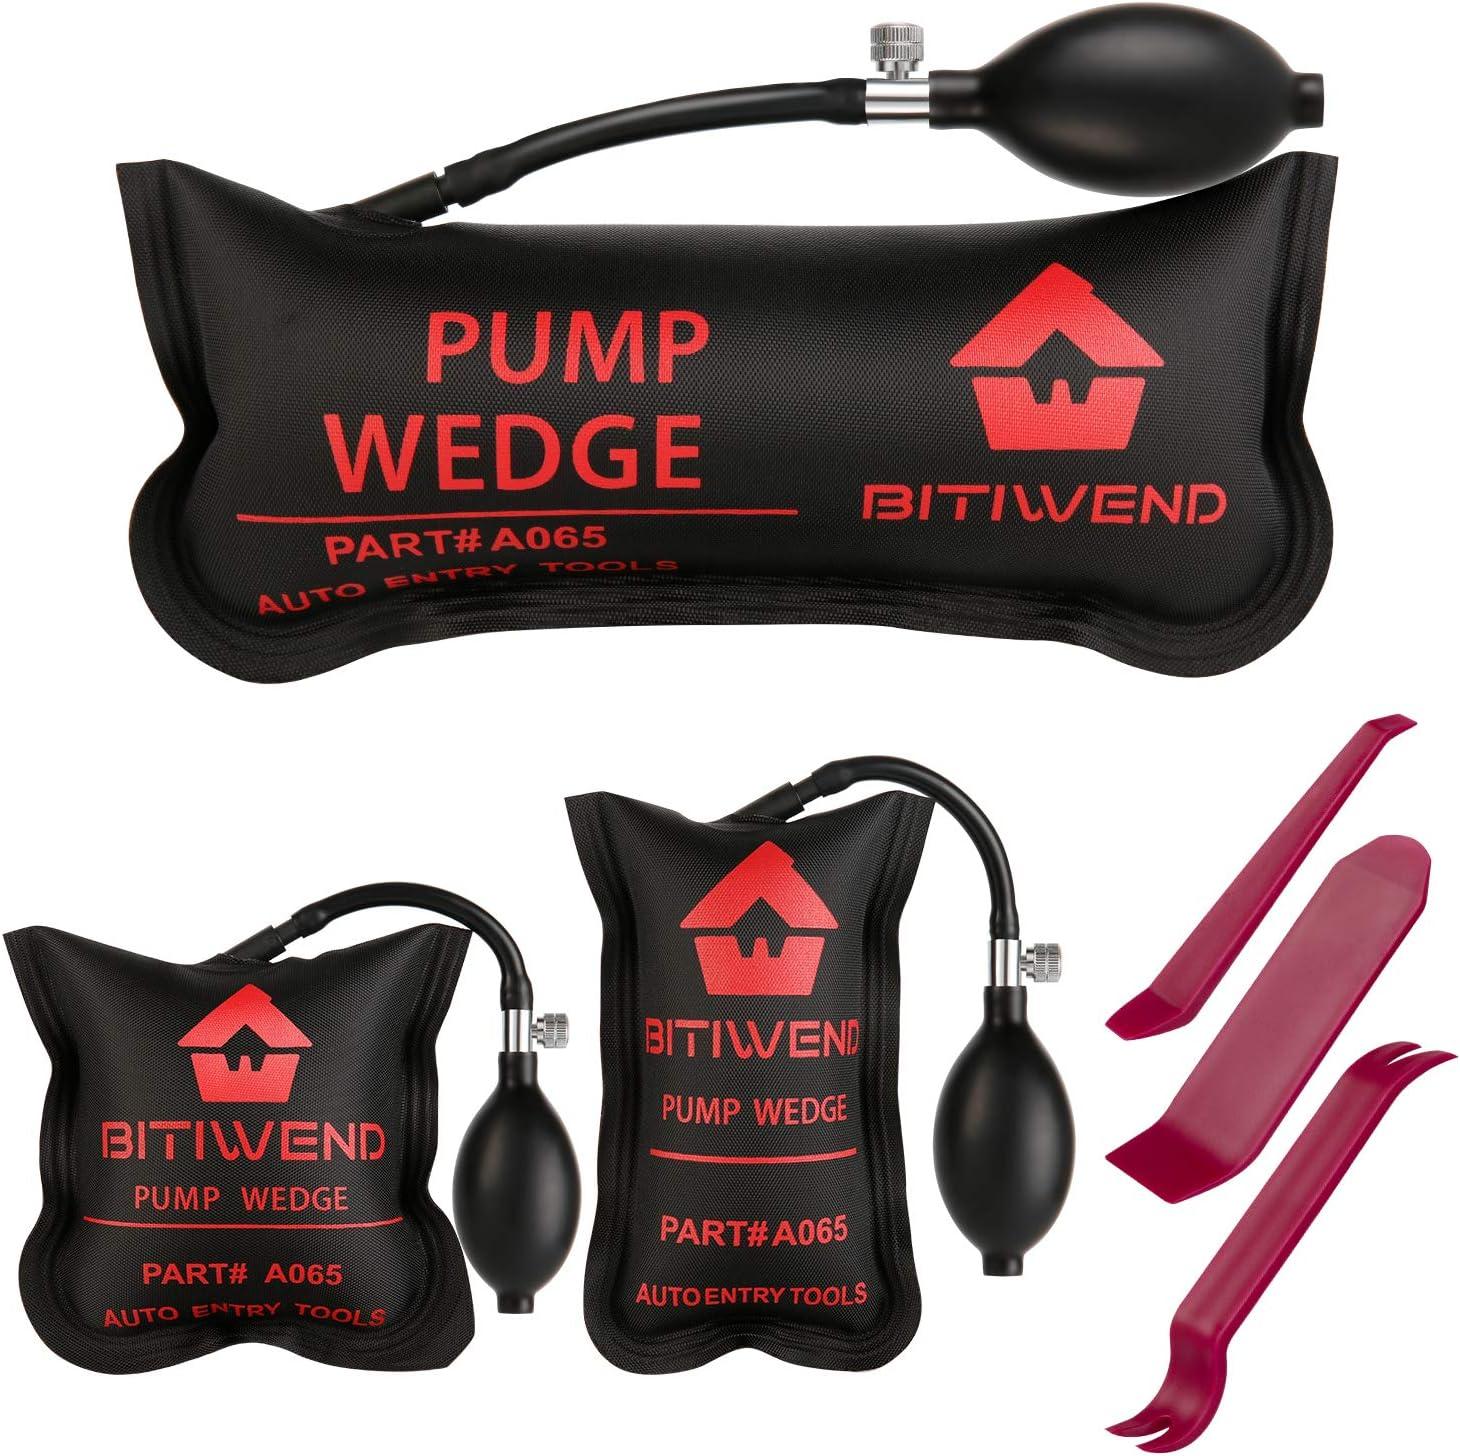 Car Air Pump Wedge Inflatable Auto Door Window Shim Entry Open Tool Kit Helpful